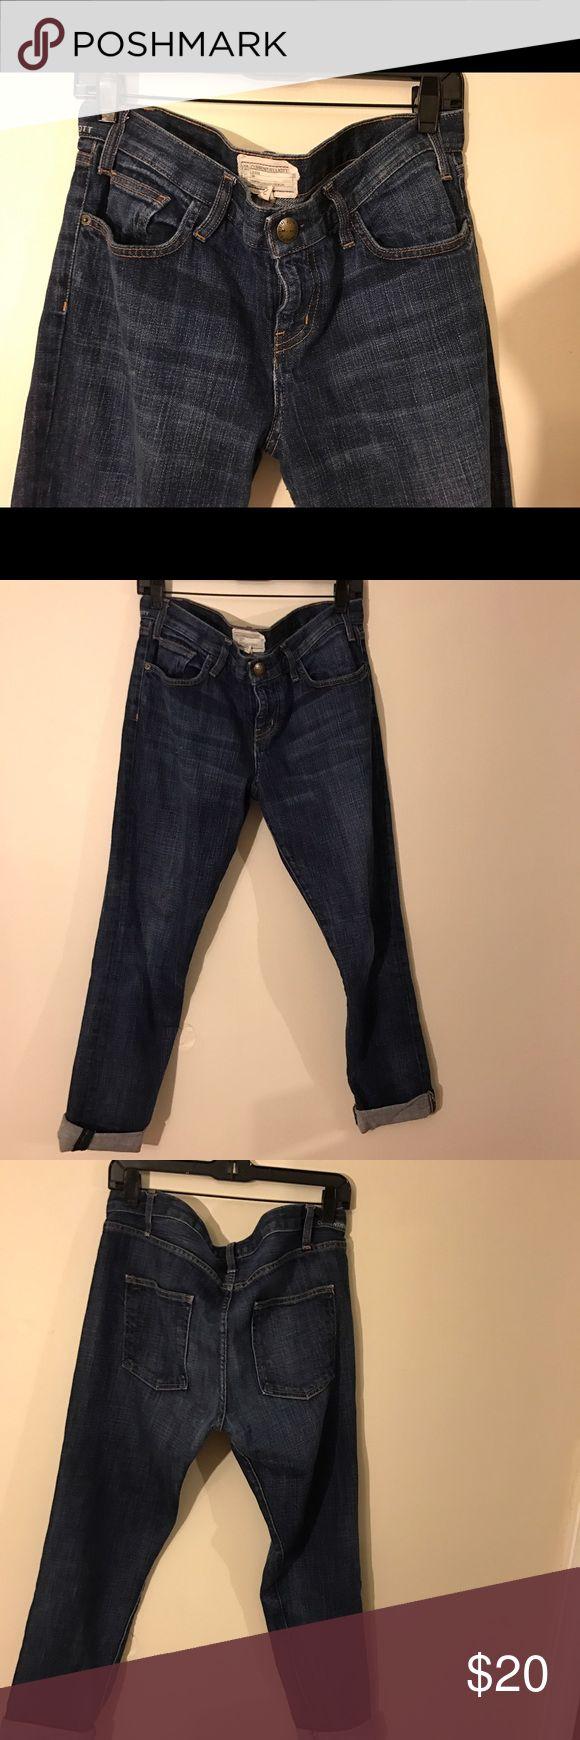 Current/Elliott boyfriend fit jeans Perfectly soft boyfriend jeans! Runs large. Current/Elliott Jeans Boyfriend